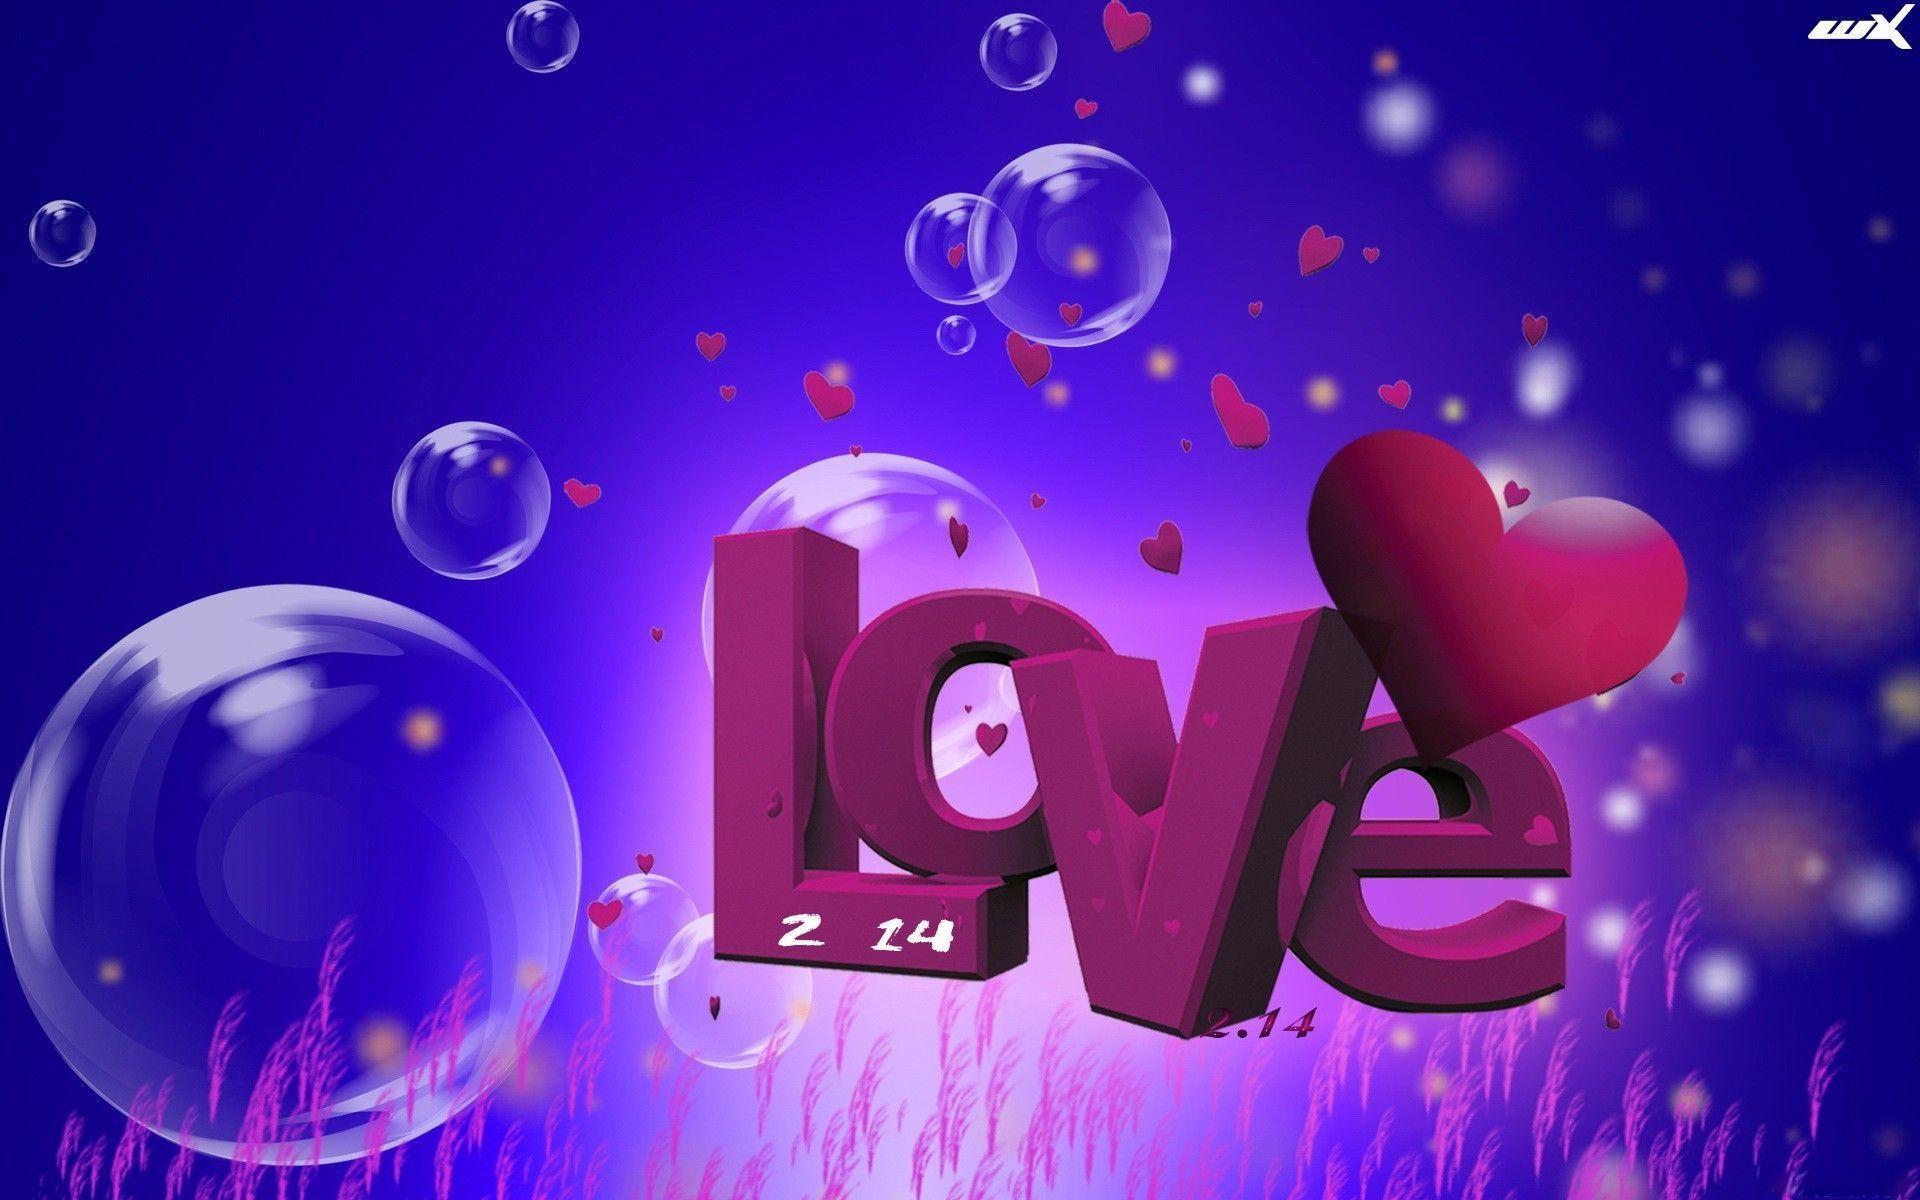 Love Hearts Wallpaper | Download Wallpapers